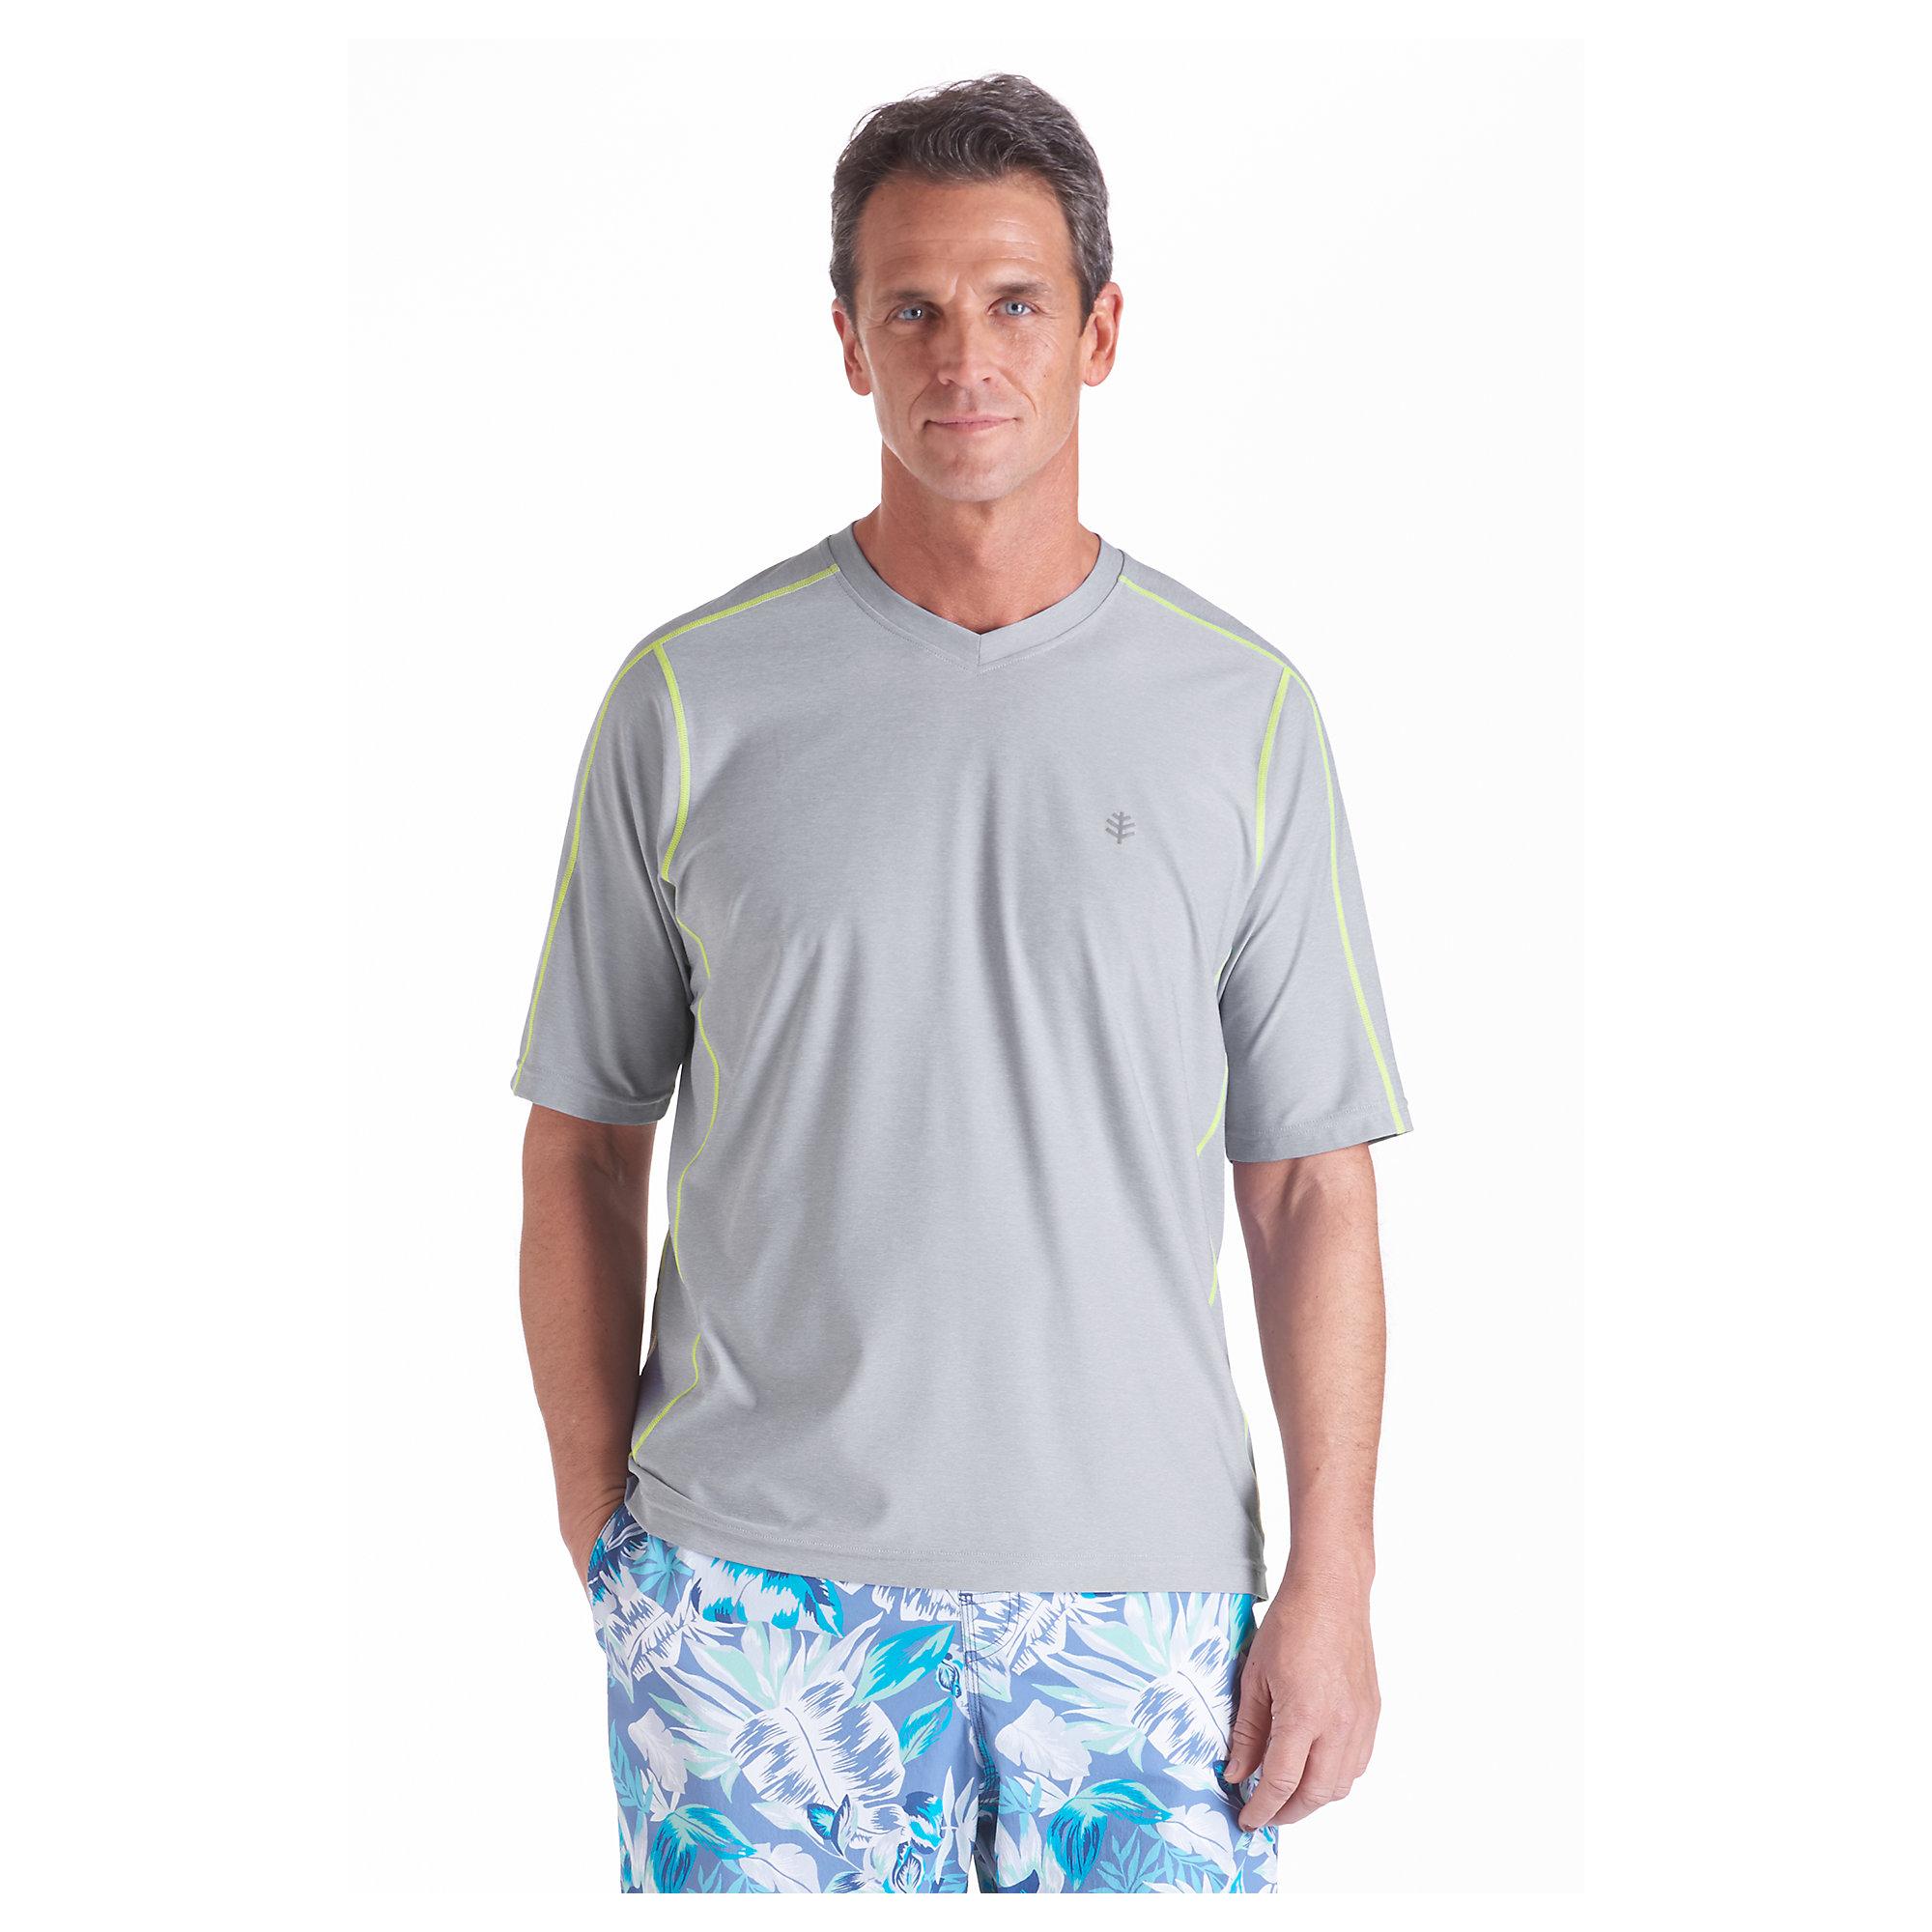 coolibar upf 50 mens short sleeve aqua t shirt uv swimwear